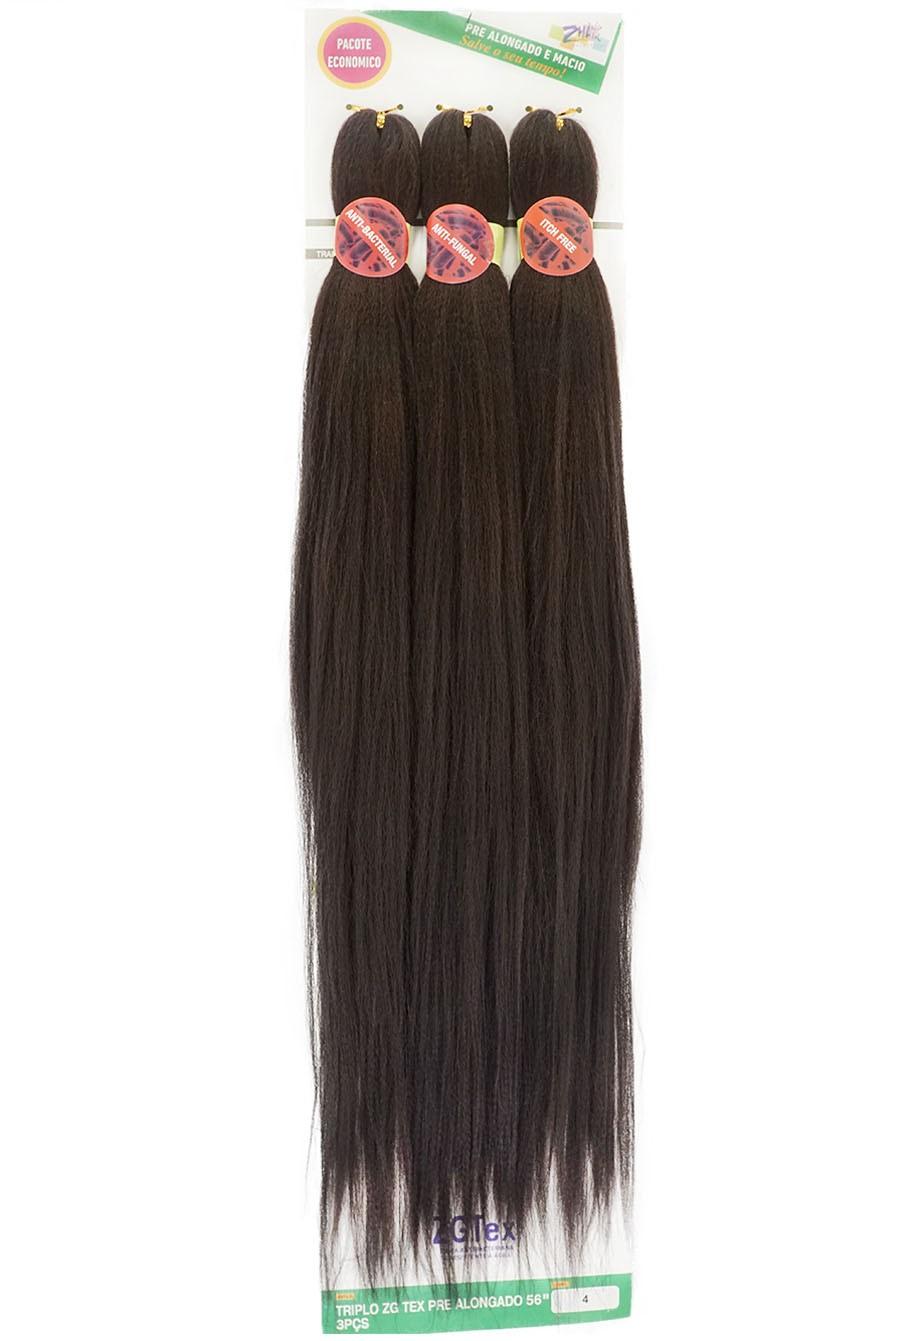 Jumbo - Zhang Hair - ZGTex (190g) - Cor: 4